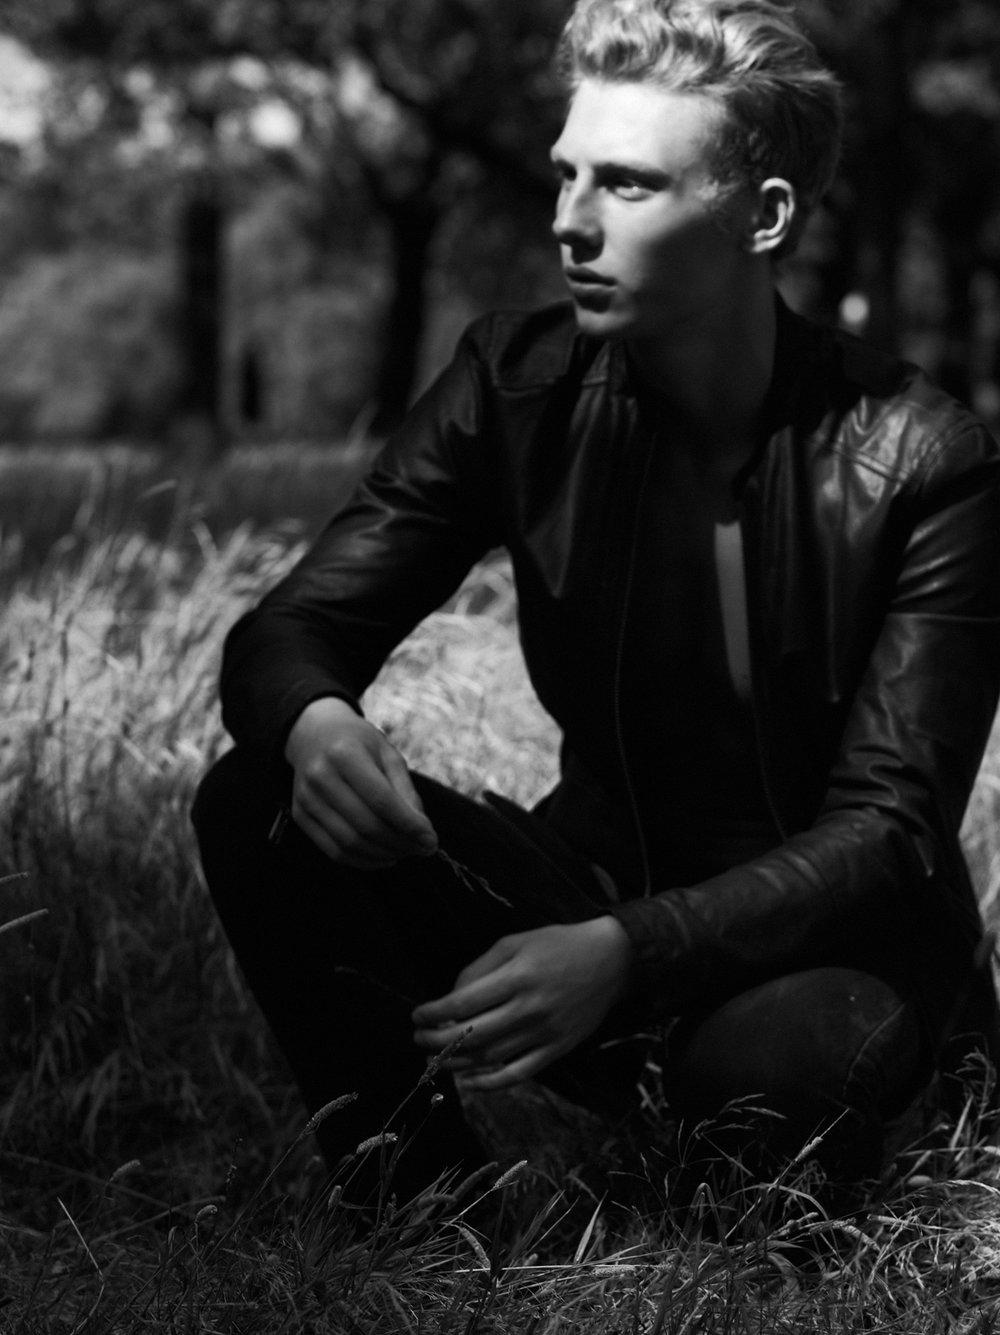 SAM-WALKER-Select-Models-Melissa-Uren-Photography-Look-10122-final-web.jpg